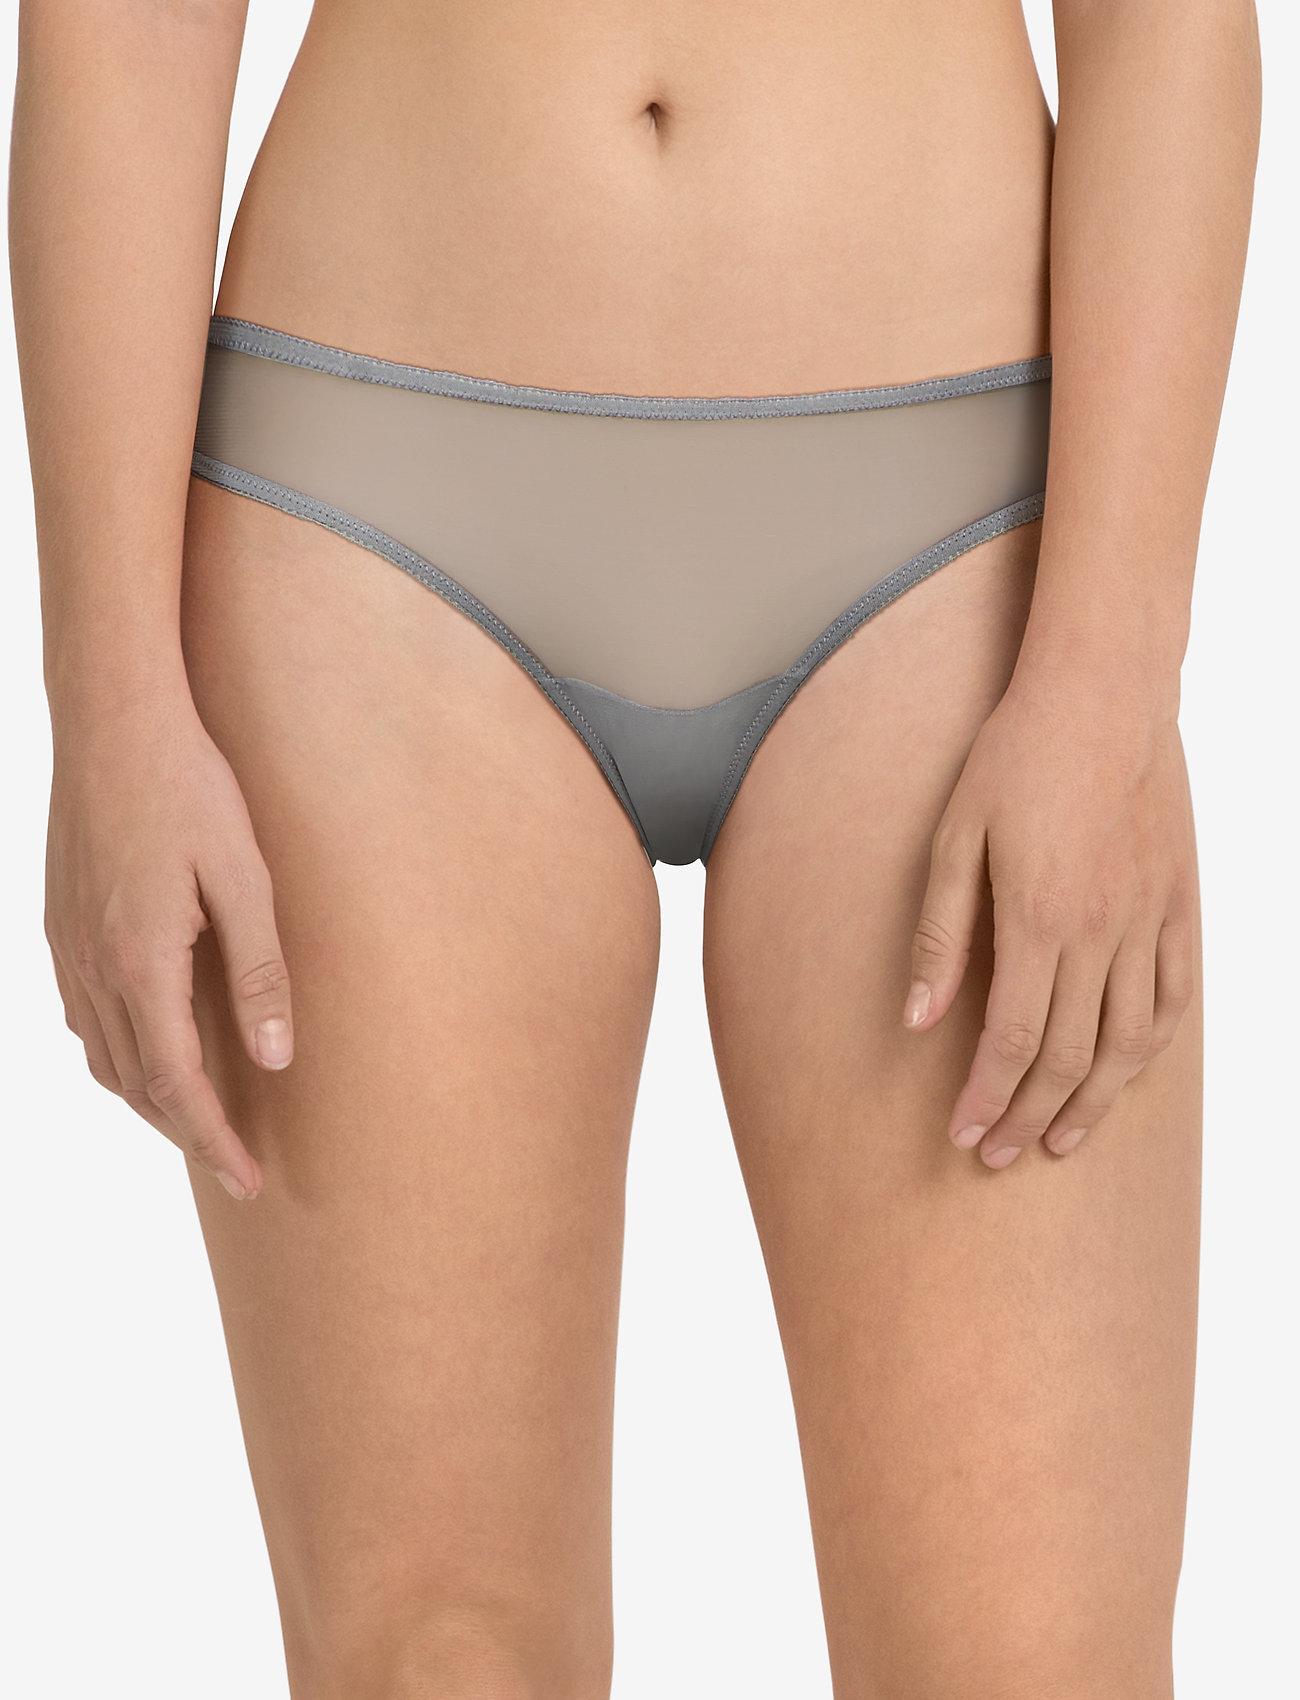 Lulu's Drawer Mae low panty - GREY